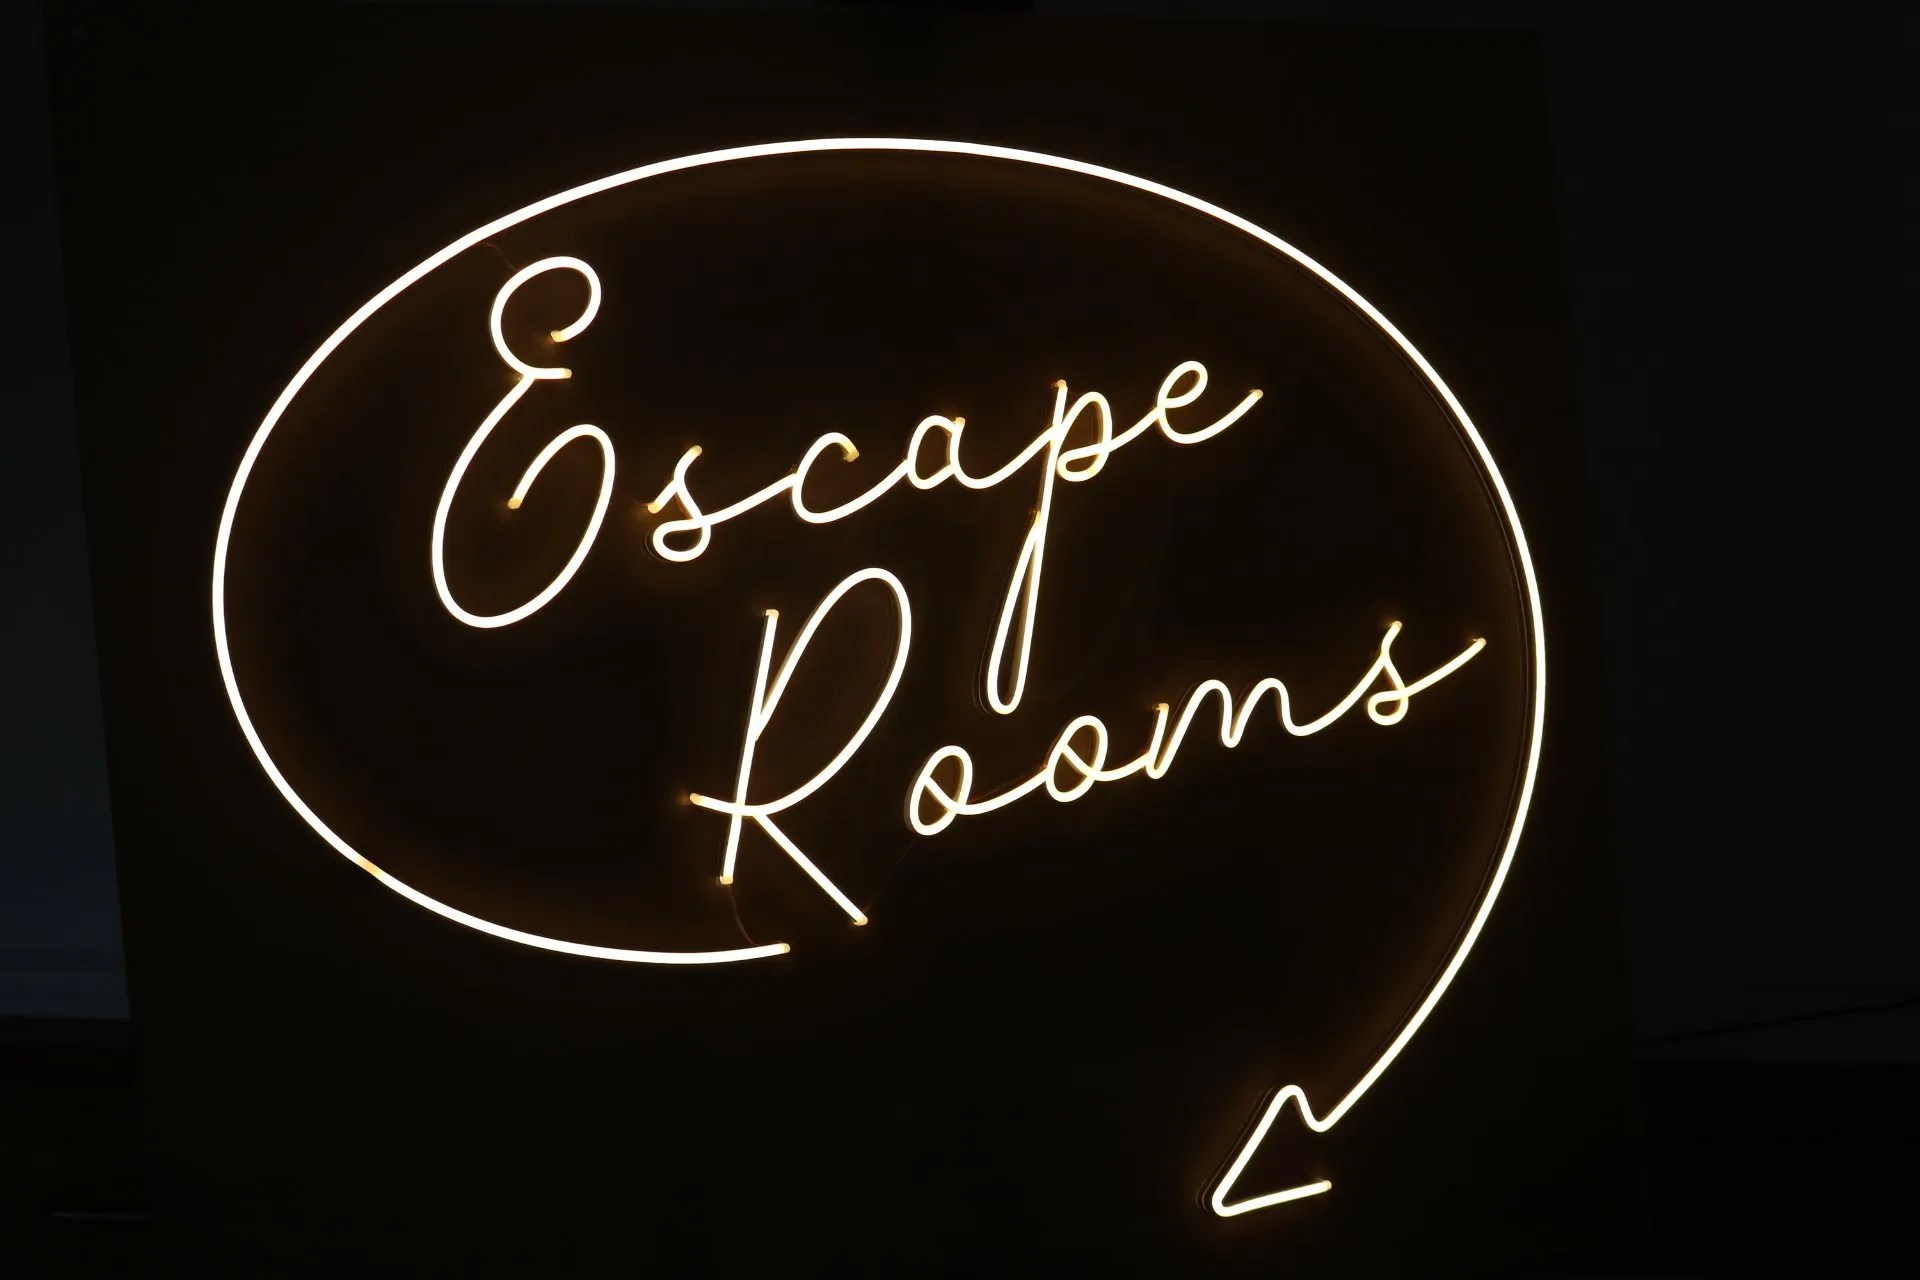 LED NEON escape rooms 1